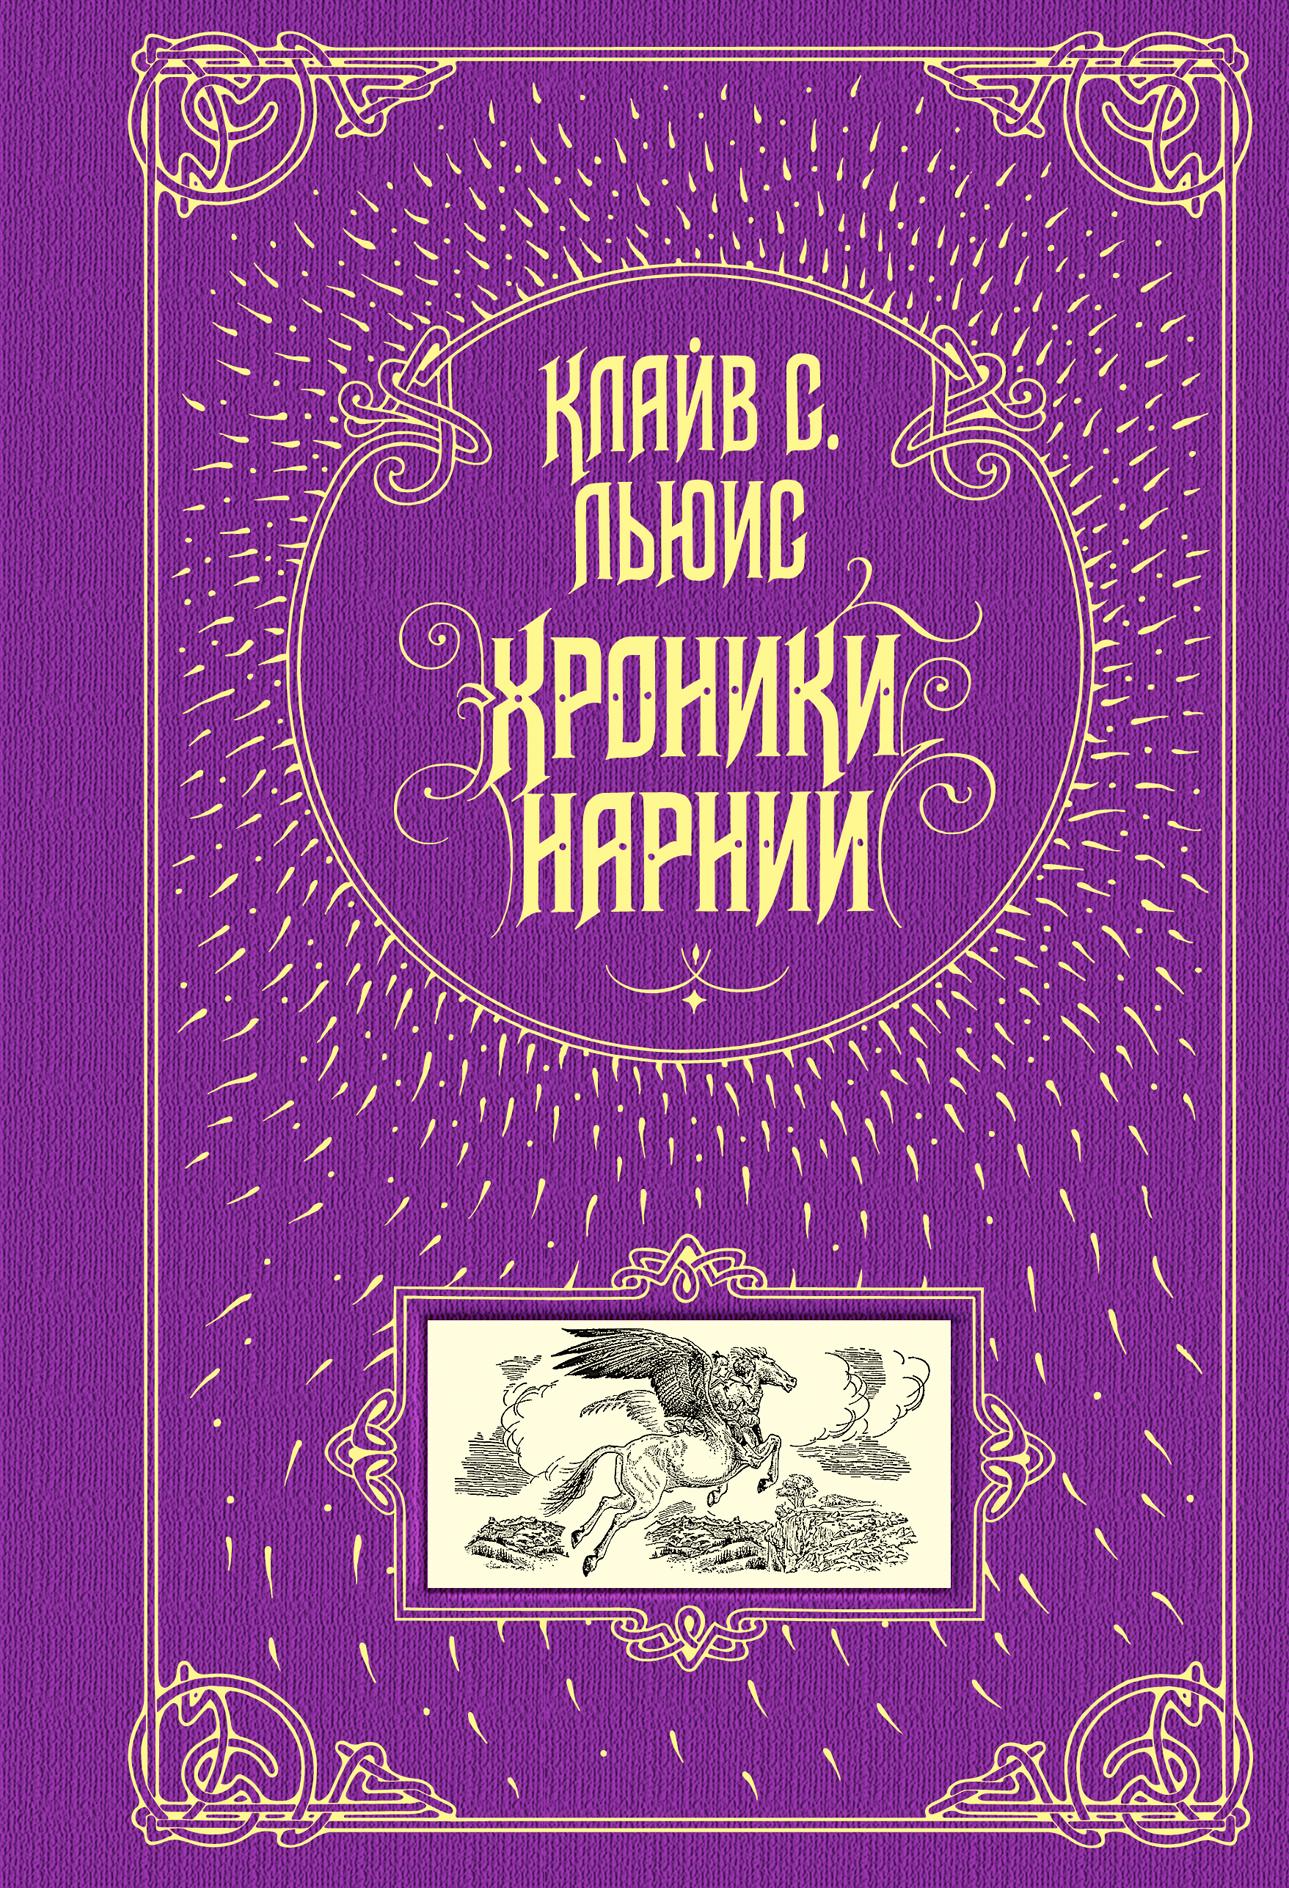 Хроники Нарнии (ил. П. Бэйнс)